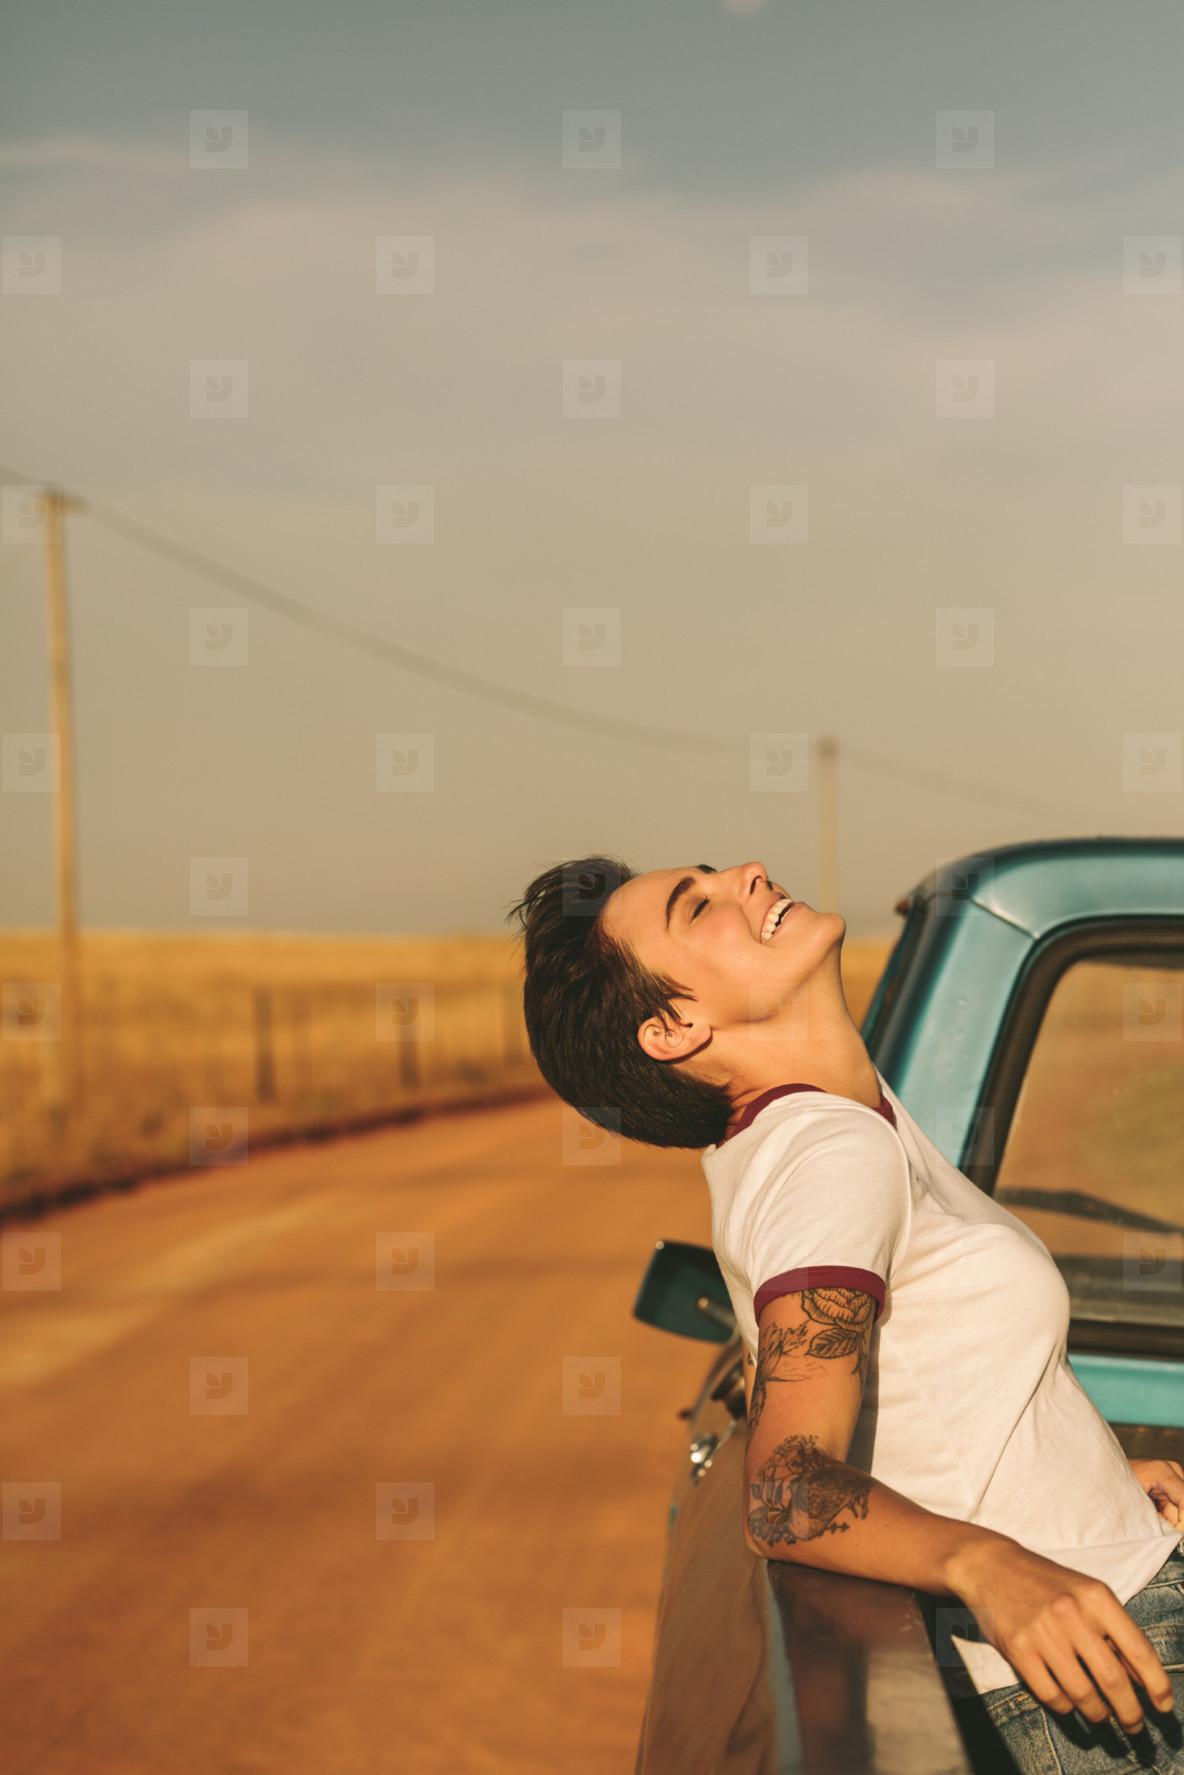 Woman enjoying on a road trip in her car